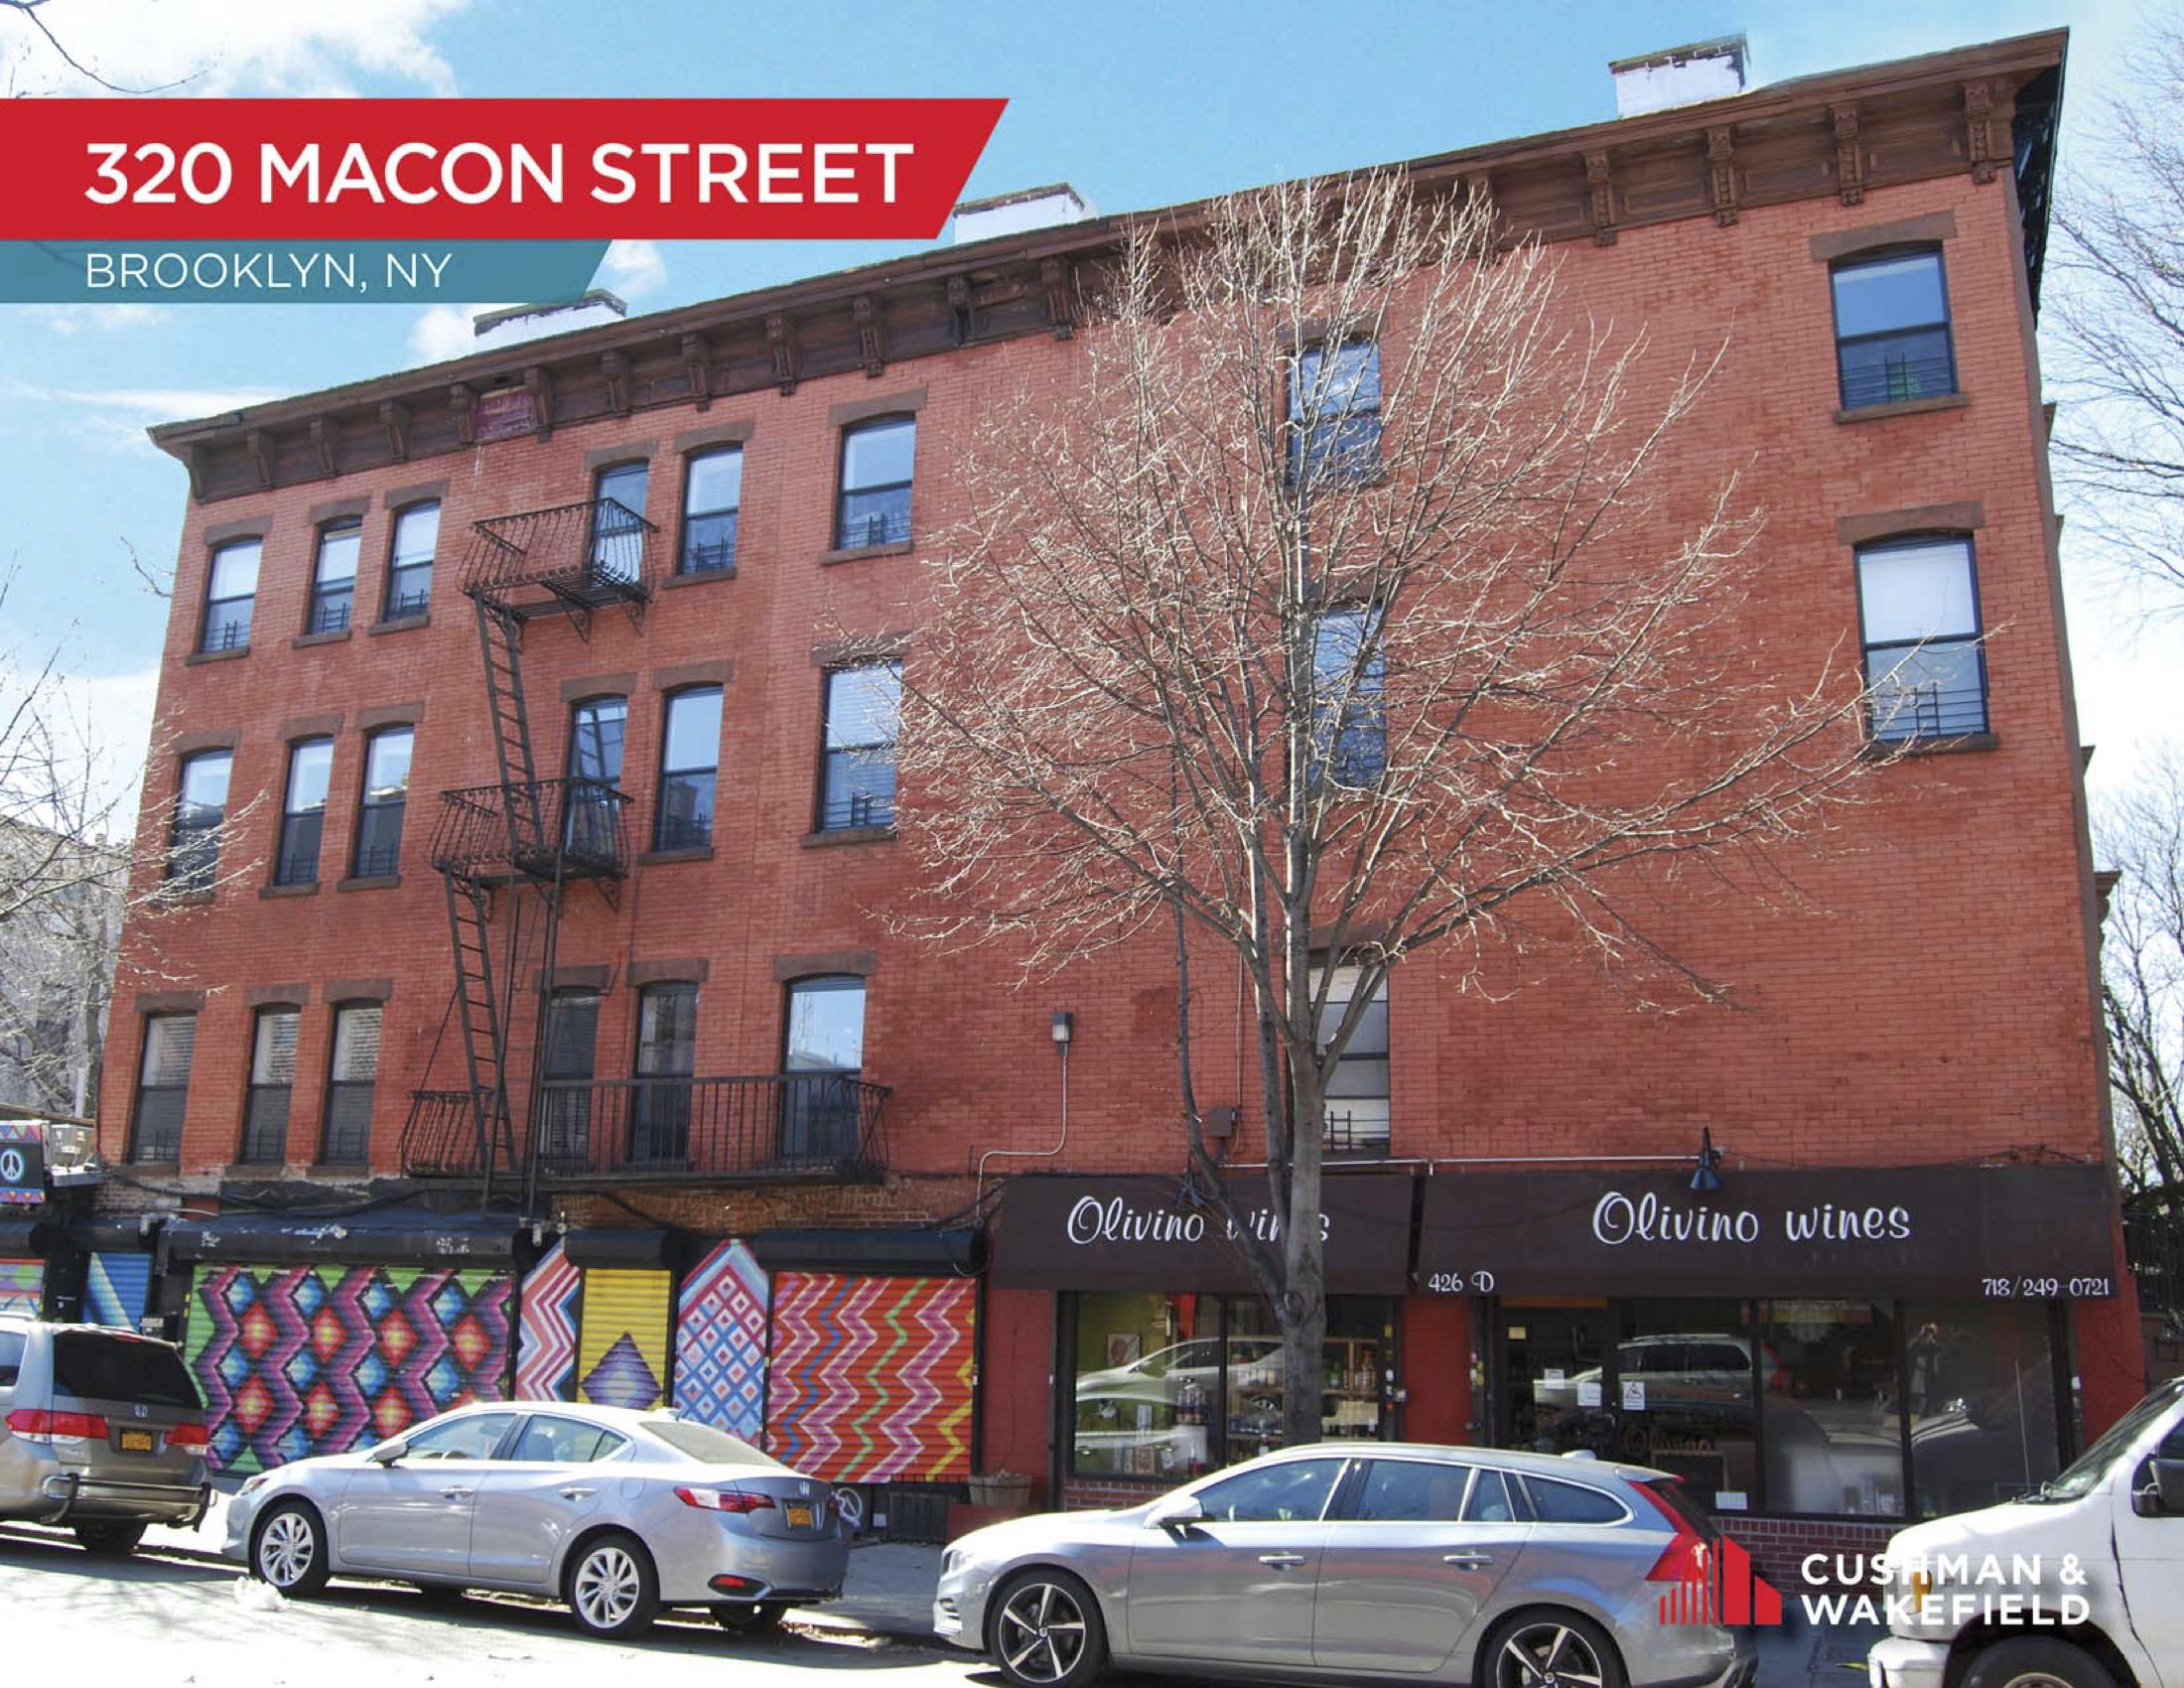 320 macon street